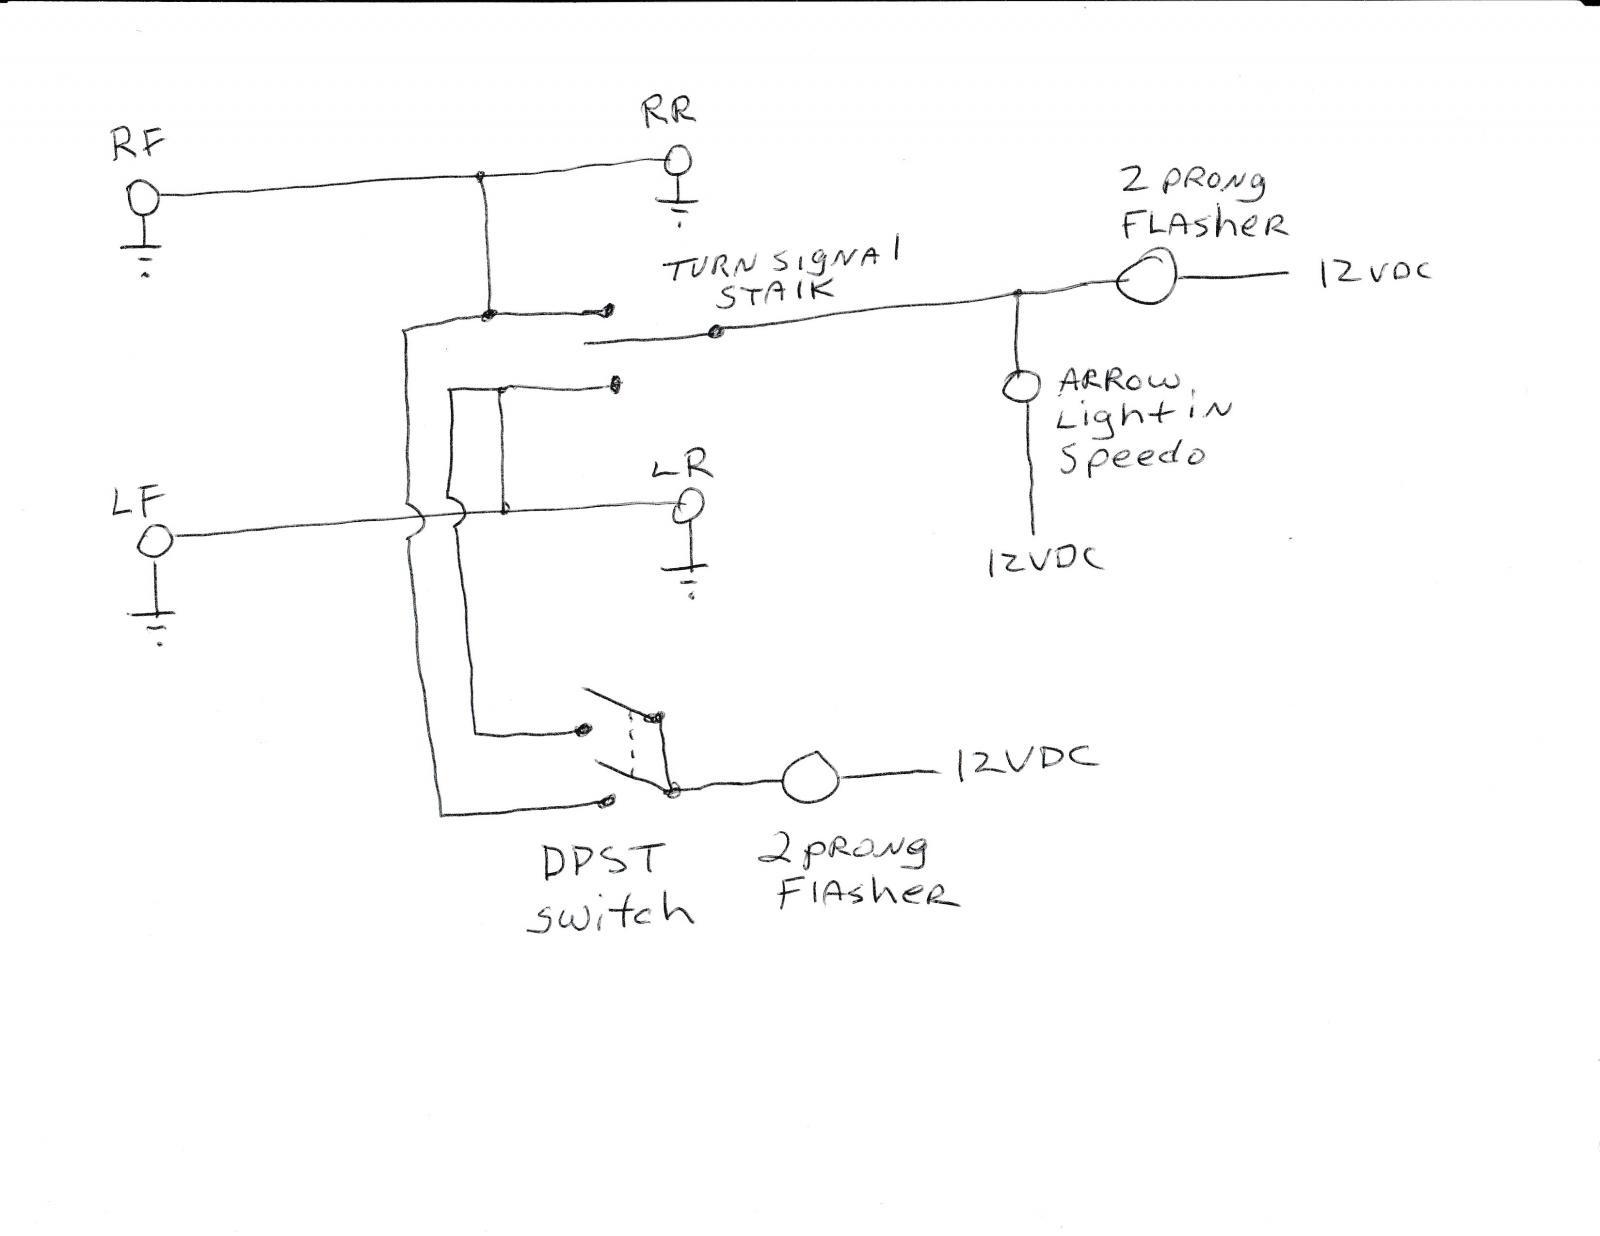 Wiring A 3 Prong Flasher thesamba Ghia View topic Emergency Hazard Of Wiring A 3 Prong Flasher